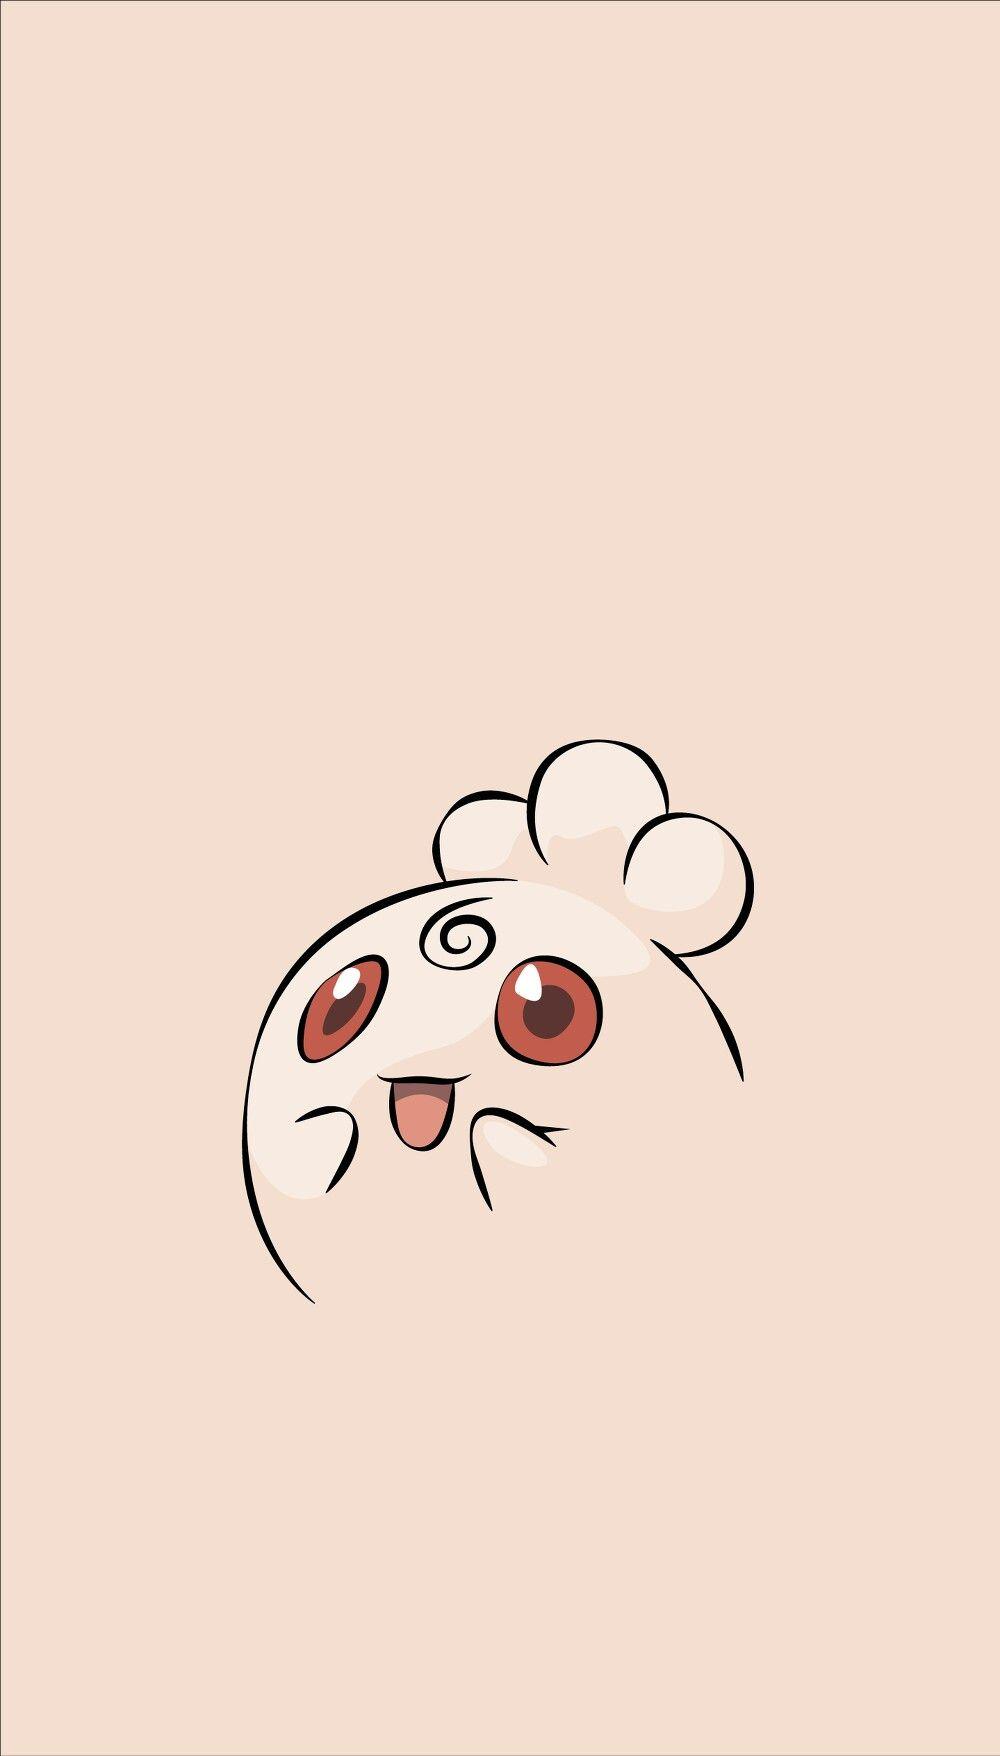 Igglybuff | Pokemon | Pinterest | Pokémon